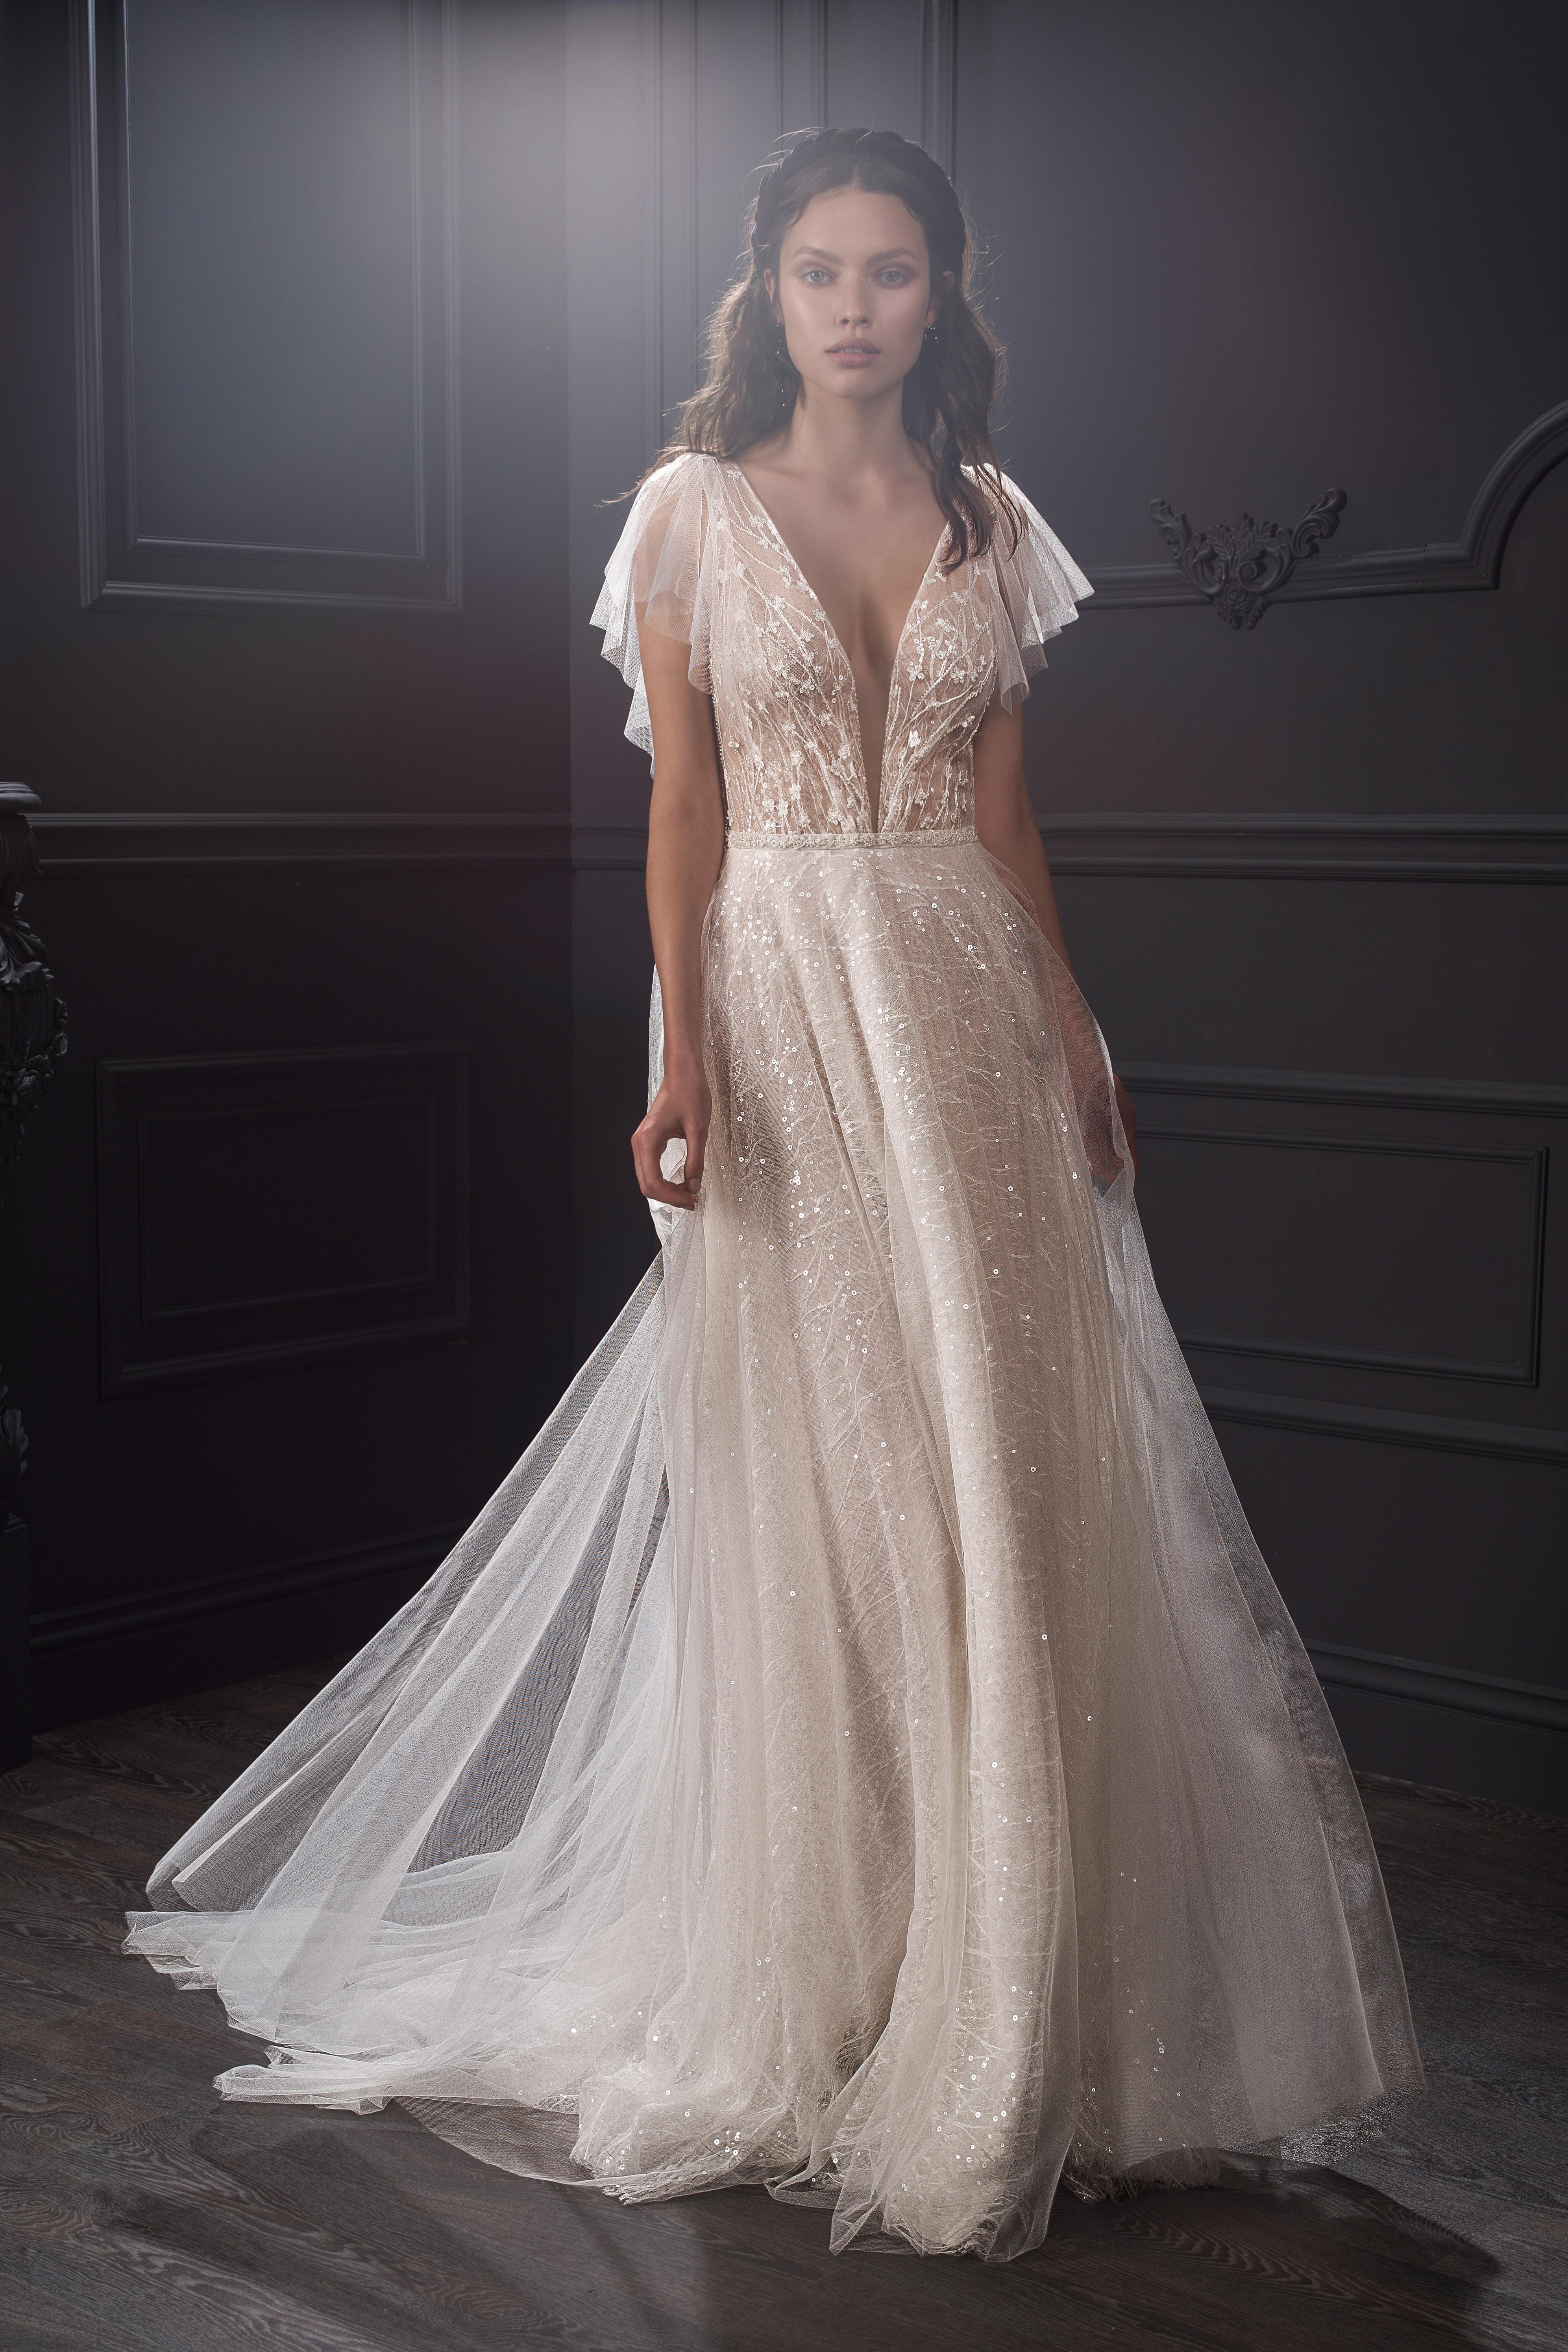 sheer lace bodice flutter sleeves glitter tulle a-line wedding dress Lihi Hod Spring 2020